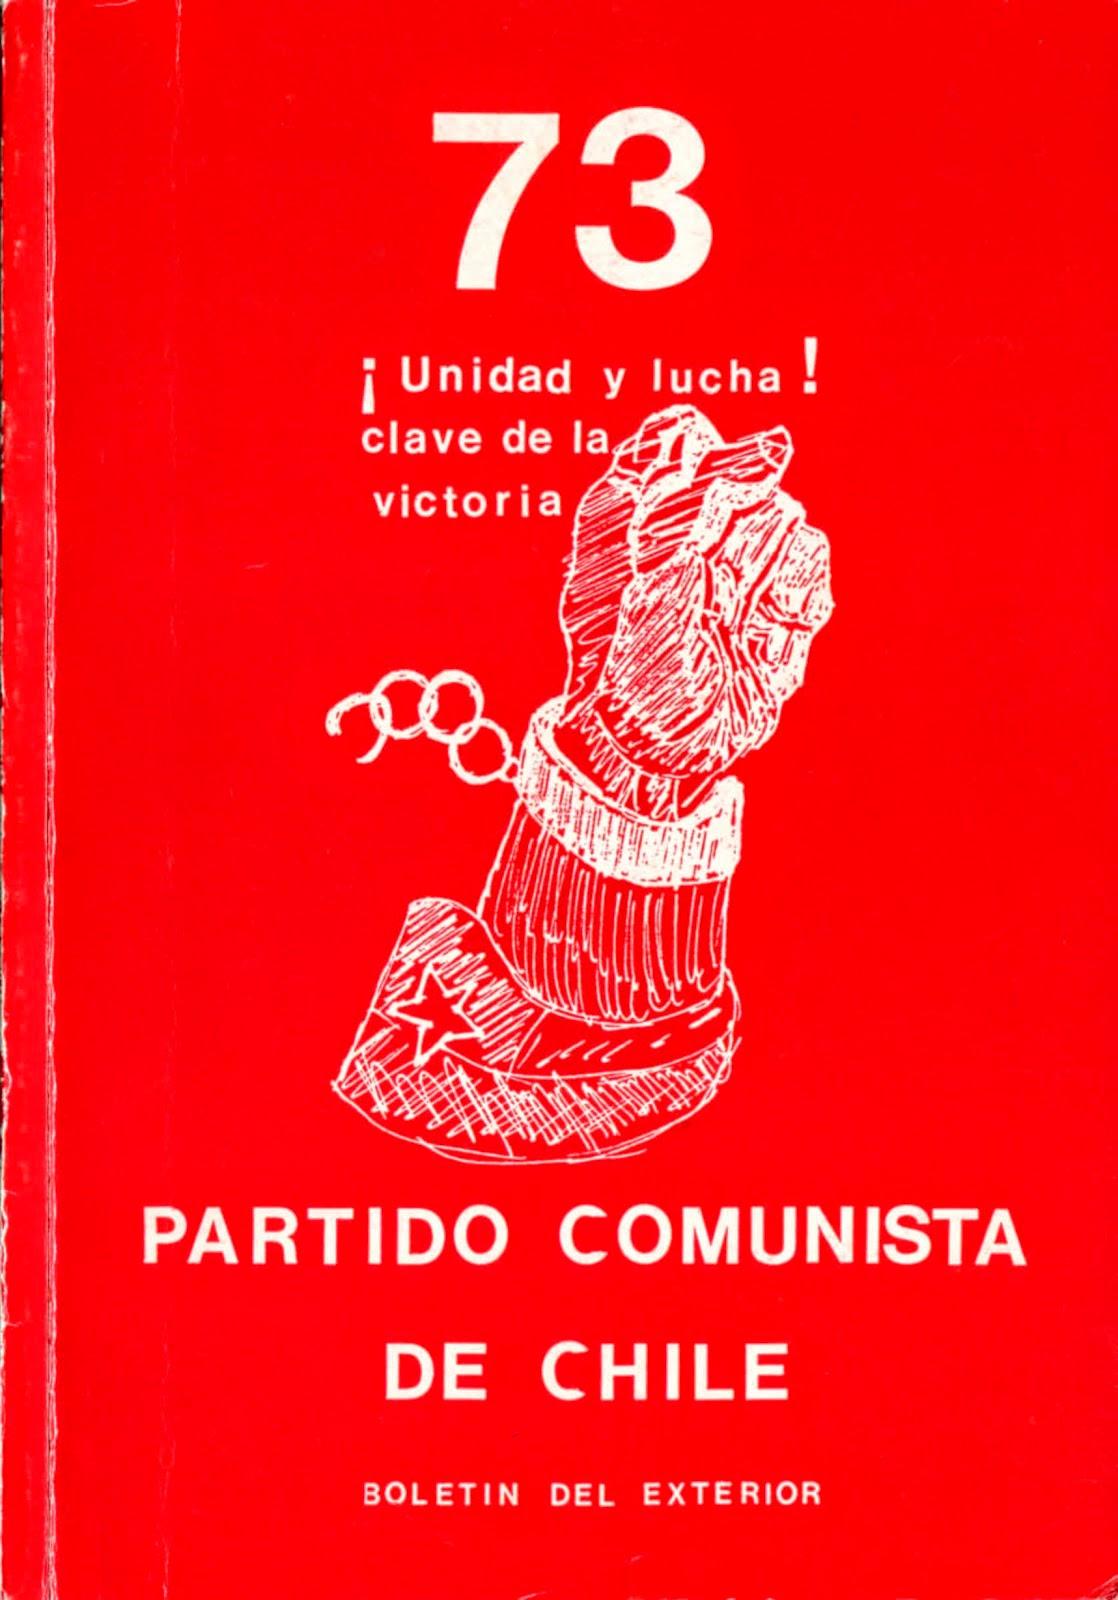 BOLETIN DEL EXTERIOR PARTIDO COMUNISTA DE CHILE